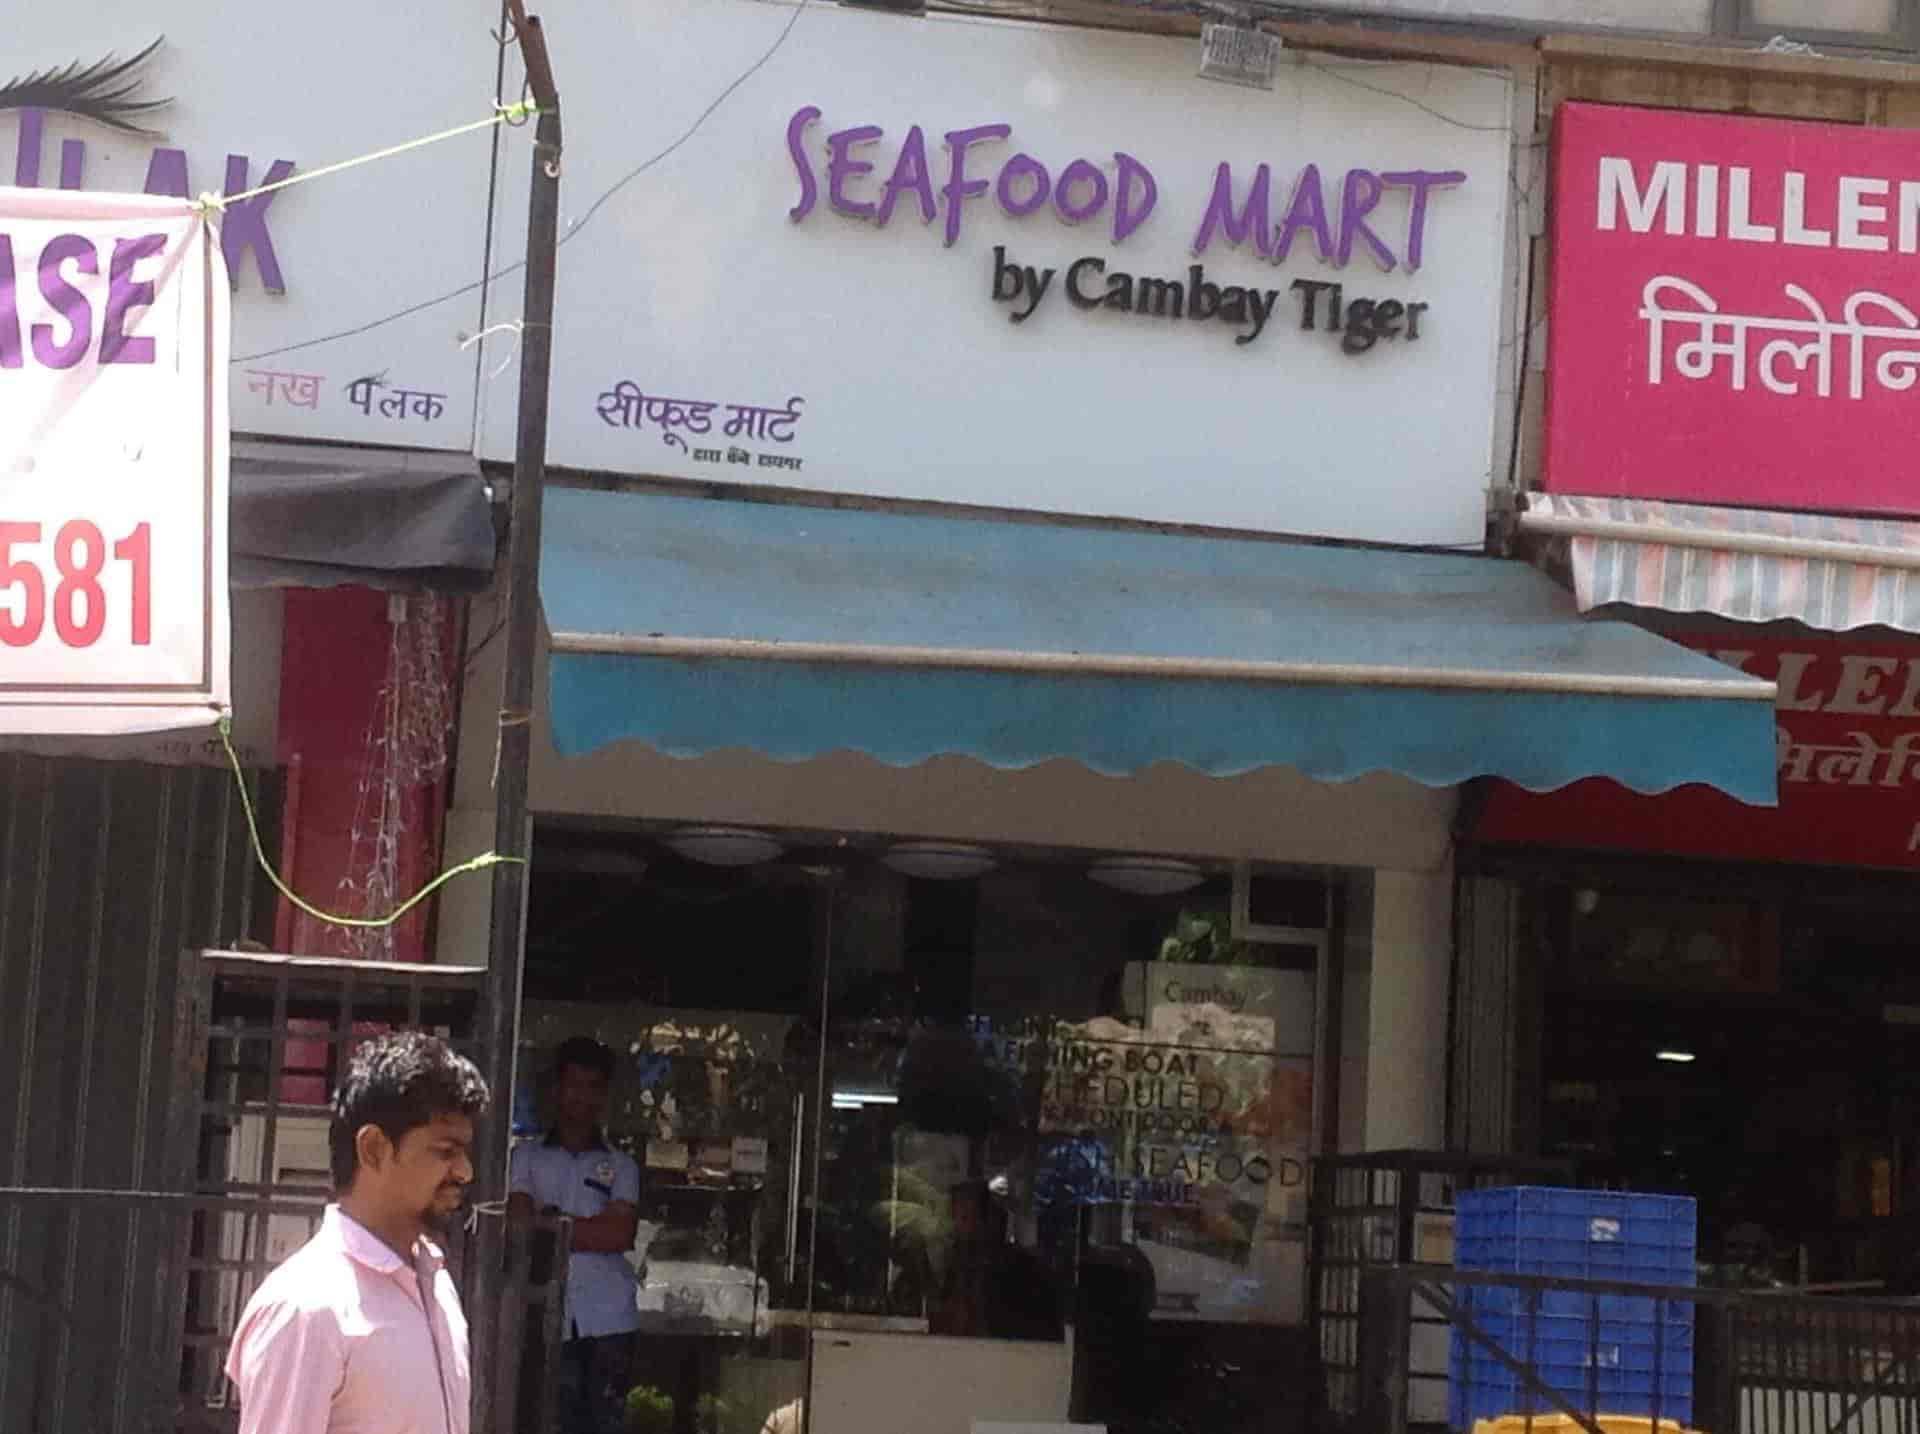 Cambay Tiger Sea Food Mart, Lokhandwala Complex-Andheri West